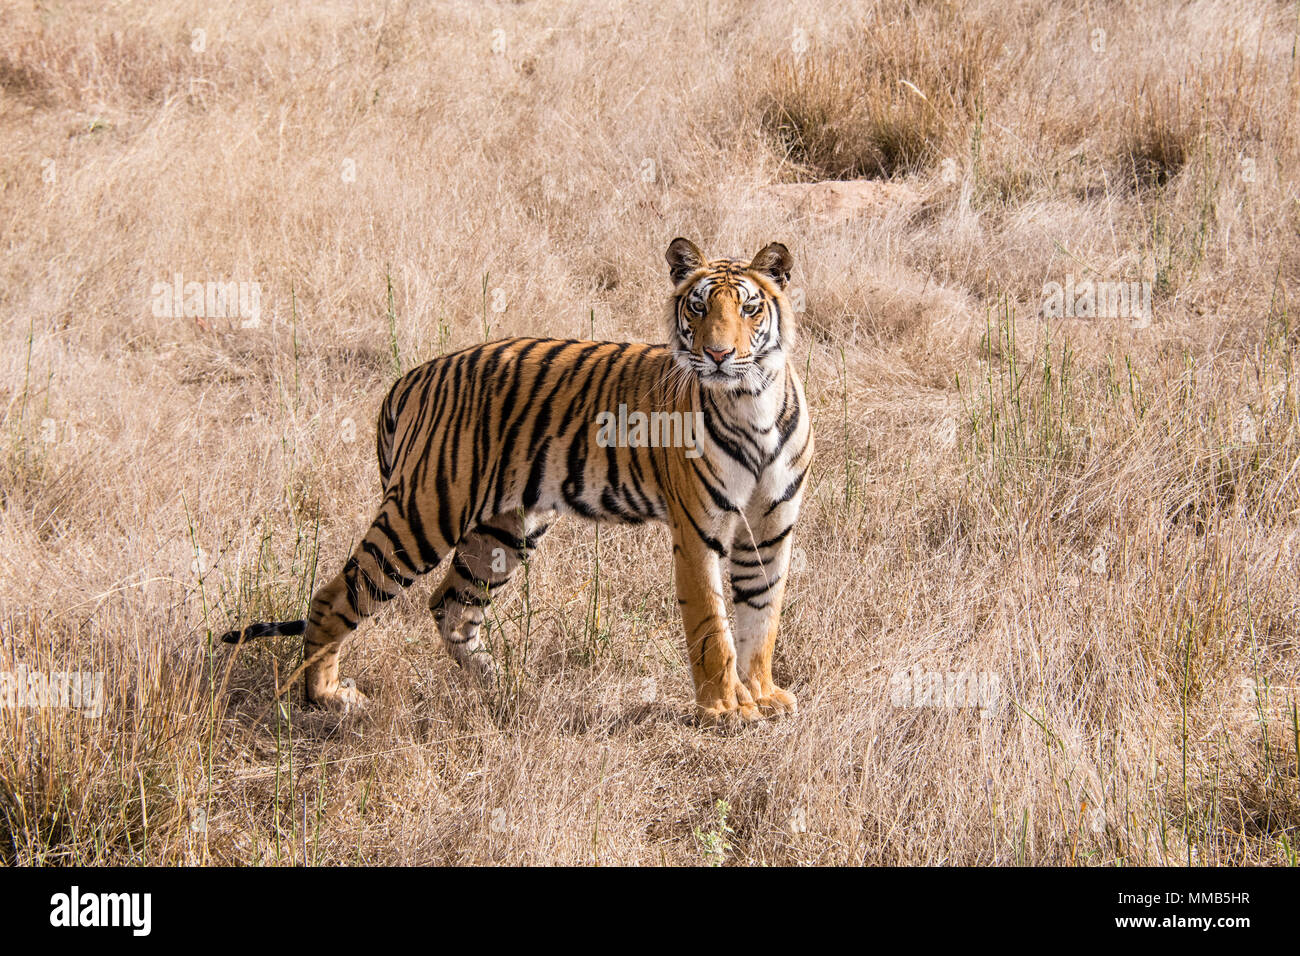 Zwei Jahre alten Bengal Tiger Cub, Panthera tigris Tigris, stehend in trockenem Gras Bandhavgarh Tiger Reserve, Madhya Pradesh, Indien Stockbild